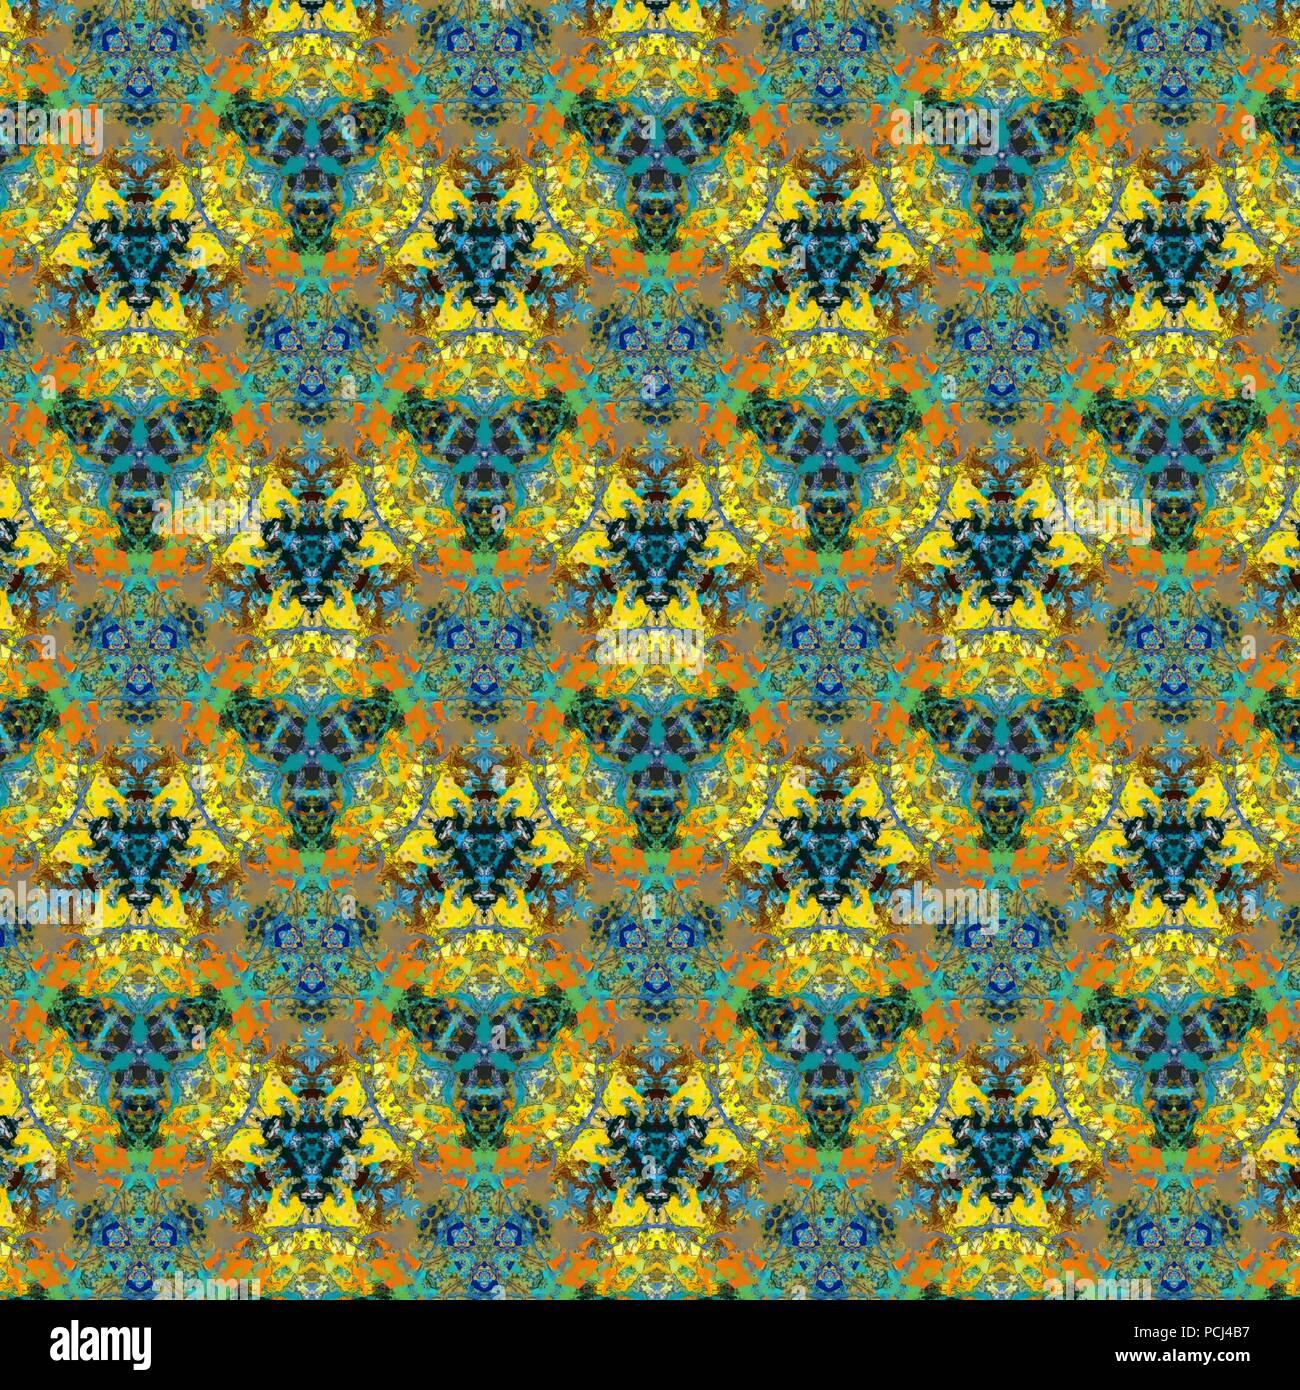 Optical Illusion Stock Photos & Optical Illusion Stock Images - Page ...